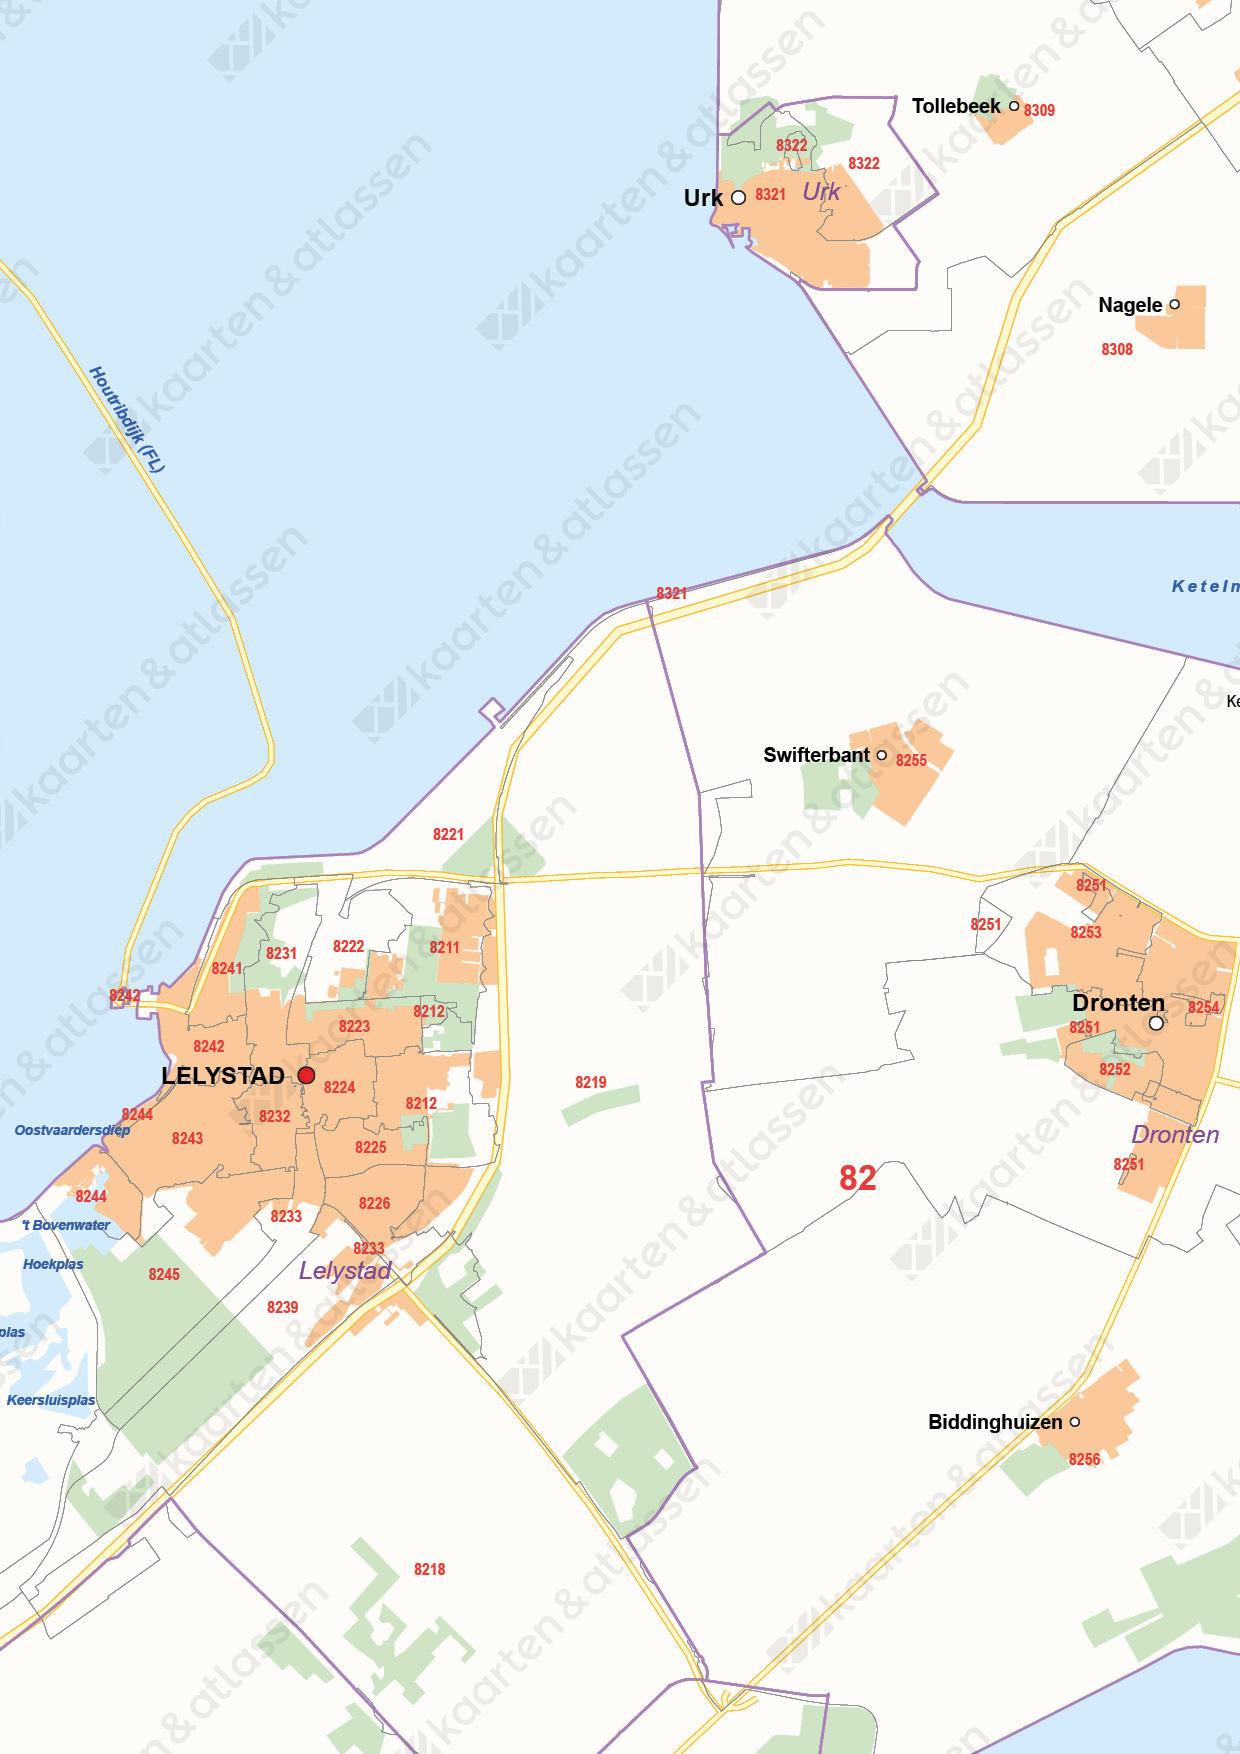 Postcode-/Gemeentekaart Flevoland